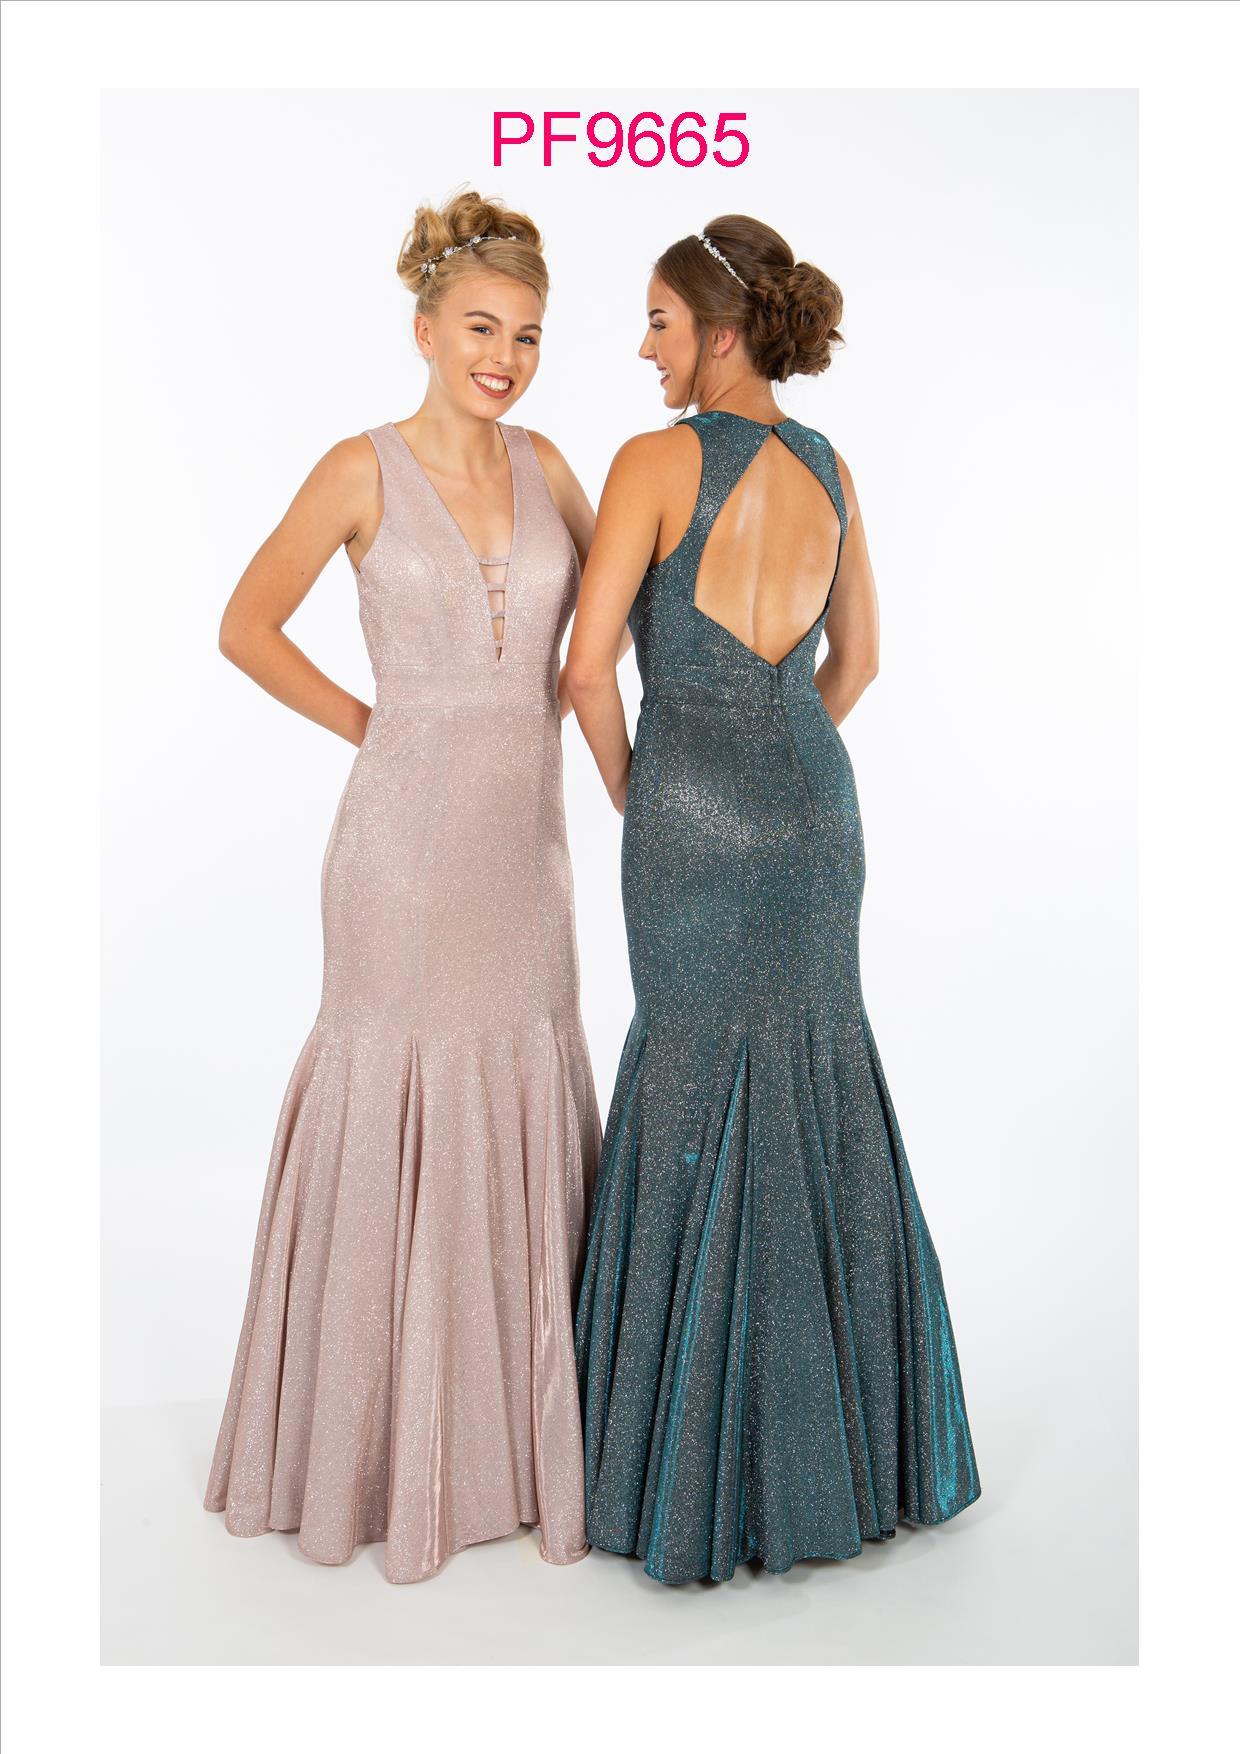 PF9606 Nude Pink Prom Dress - Prom Frocks UK Prom Dresses